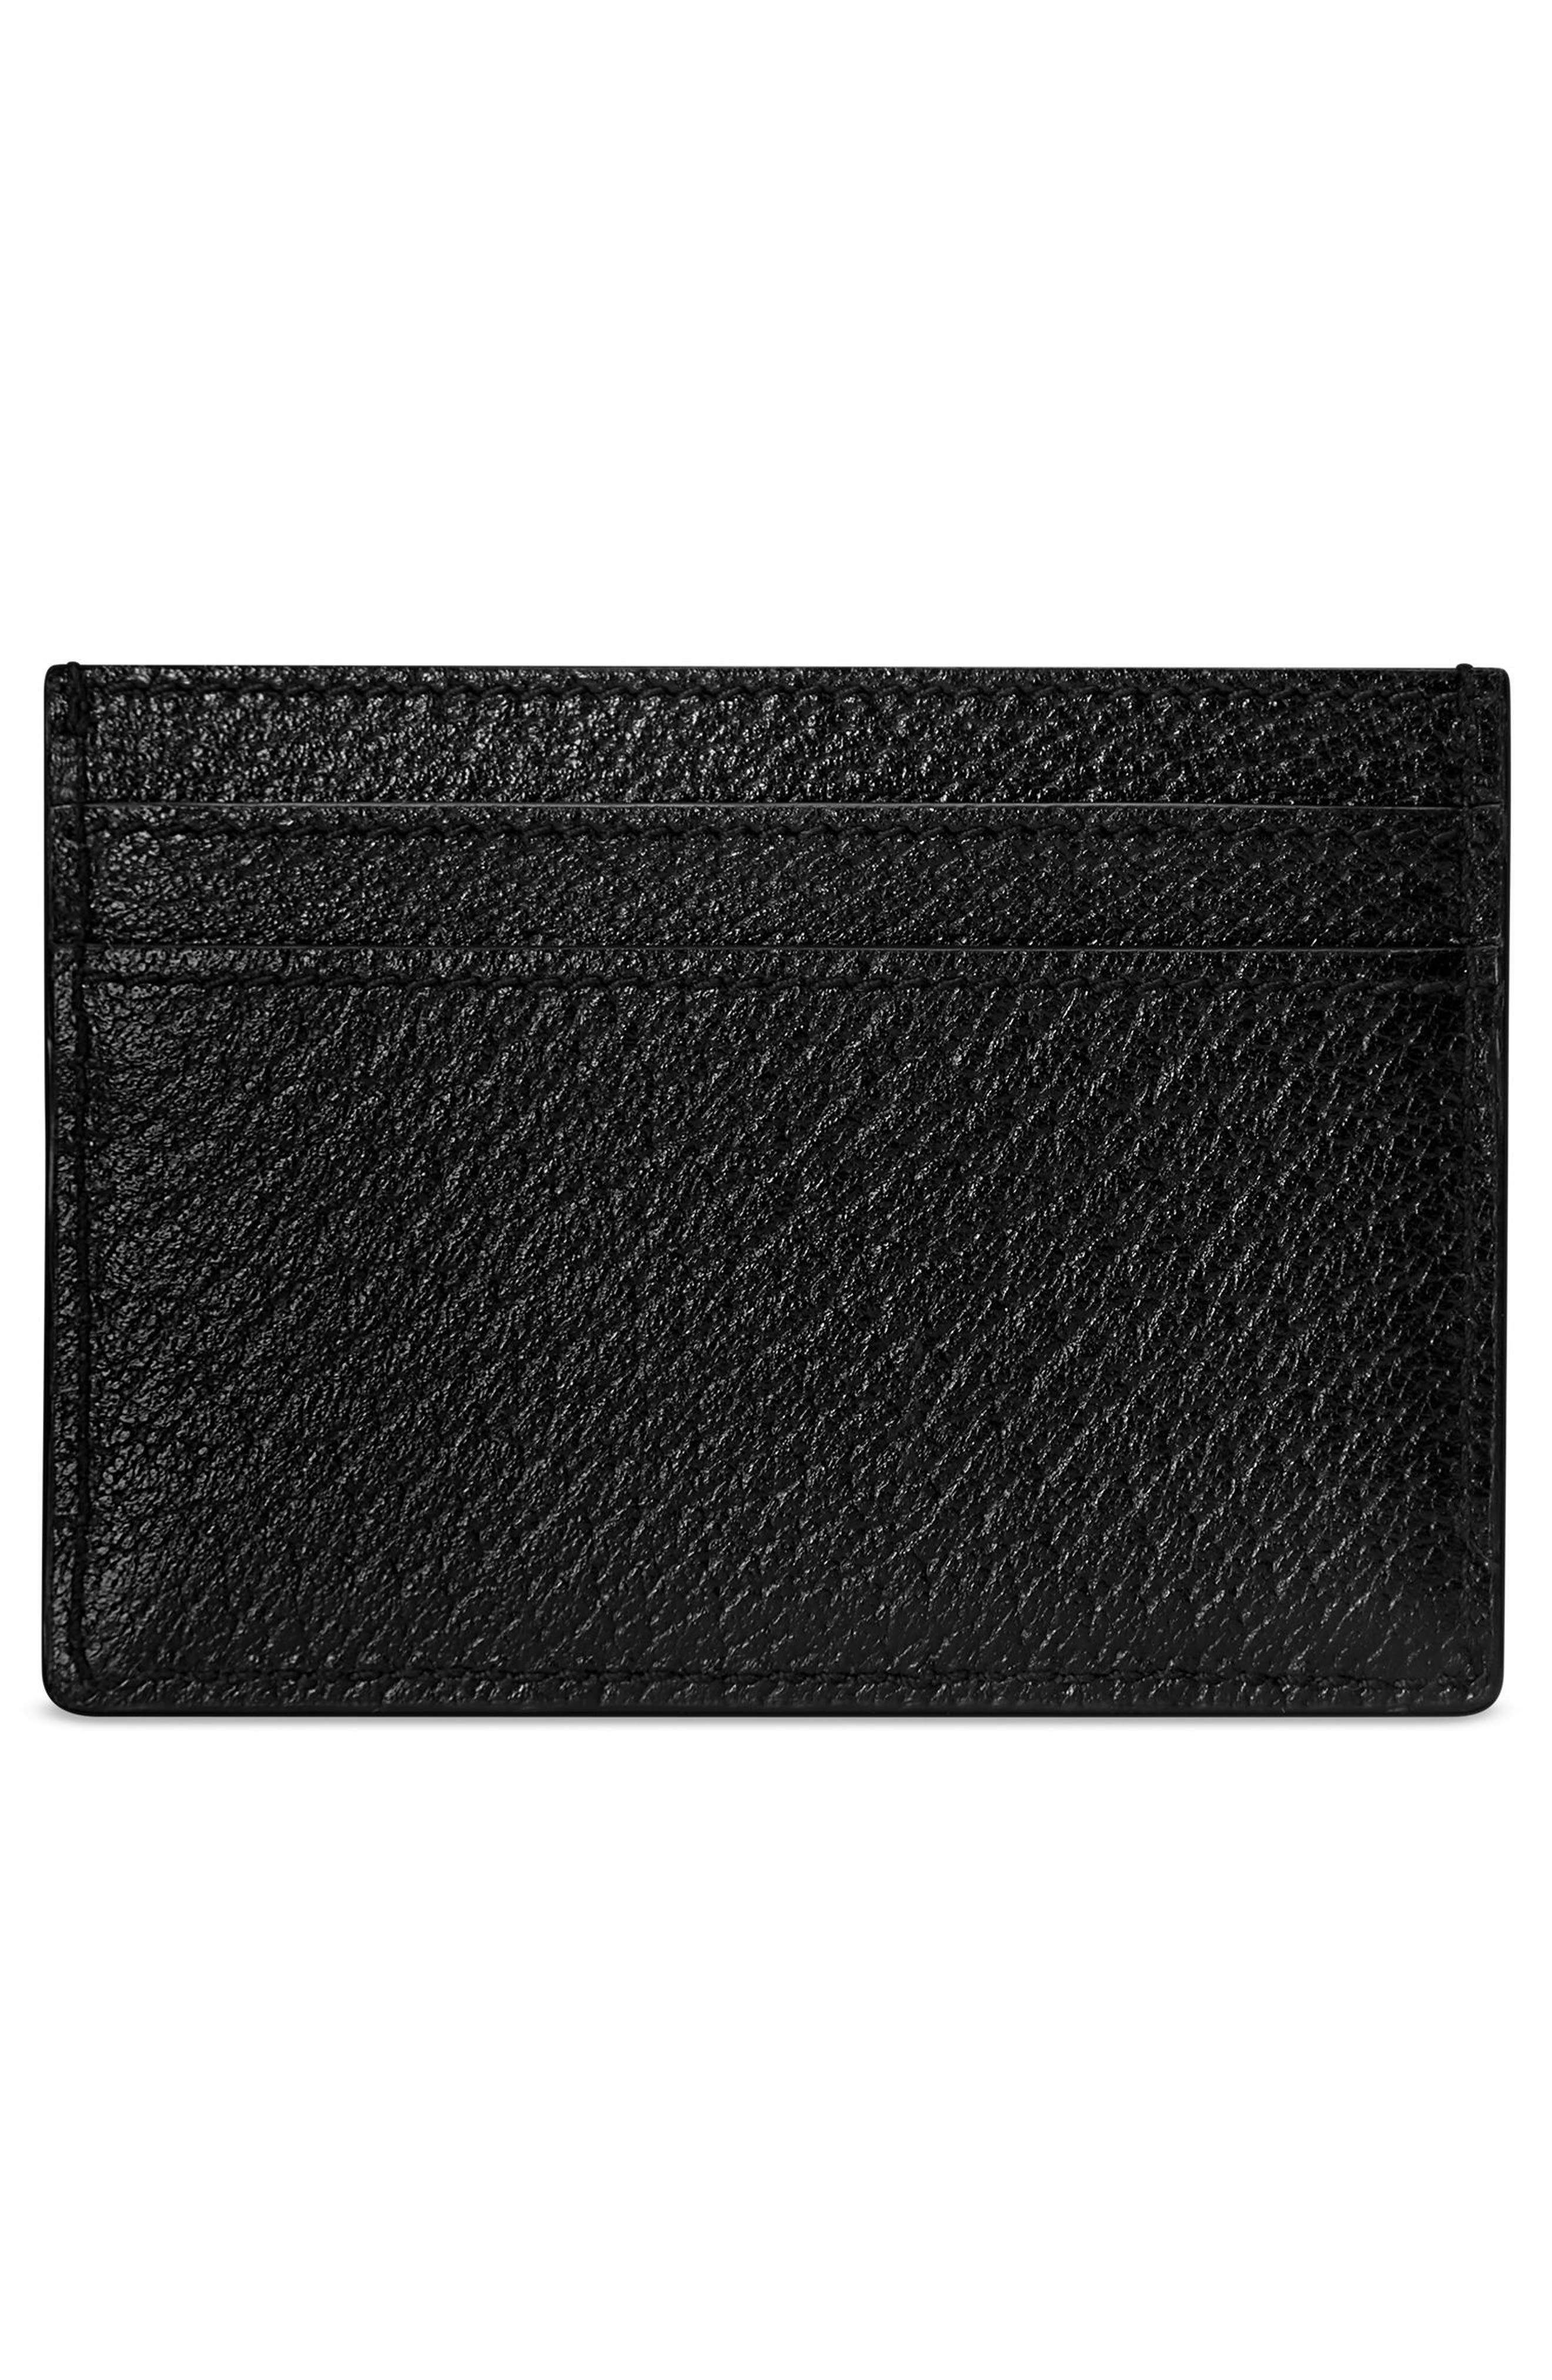 ,                             Ophidia Leather Card Case,                             Alternate thumbnail 2, color,                             NERO/ VERT RED VERT